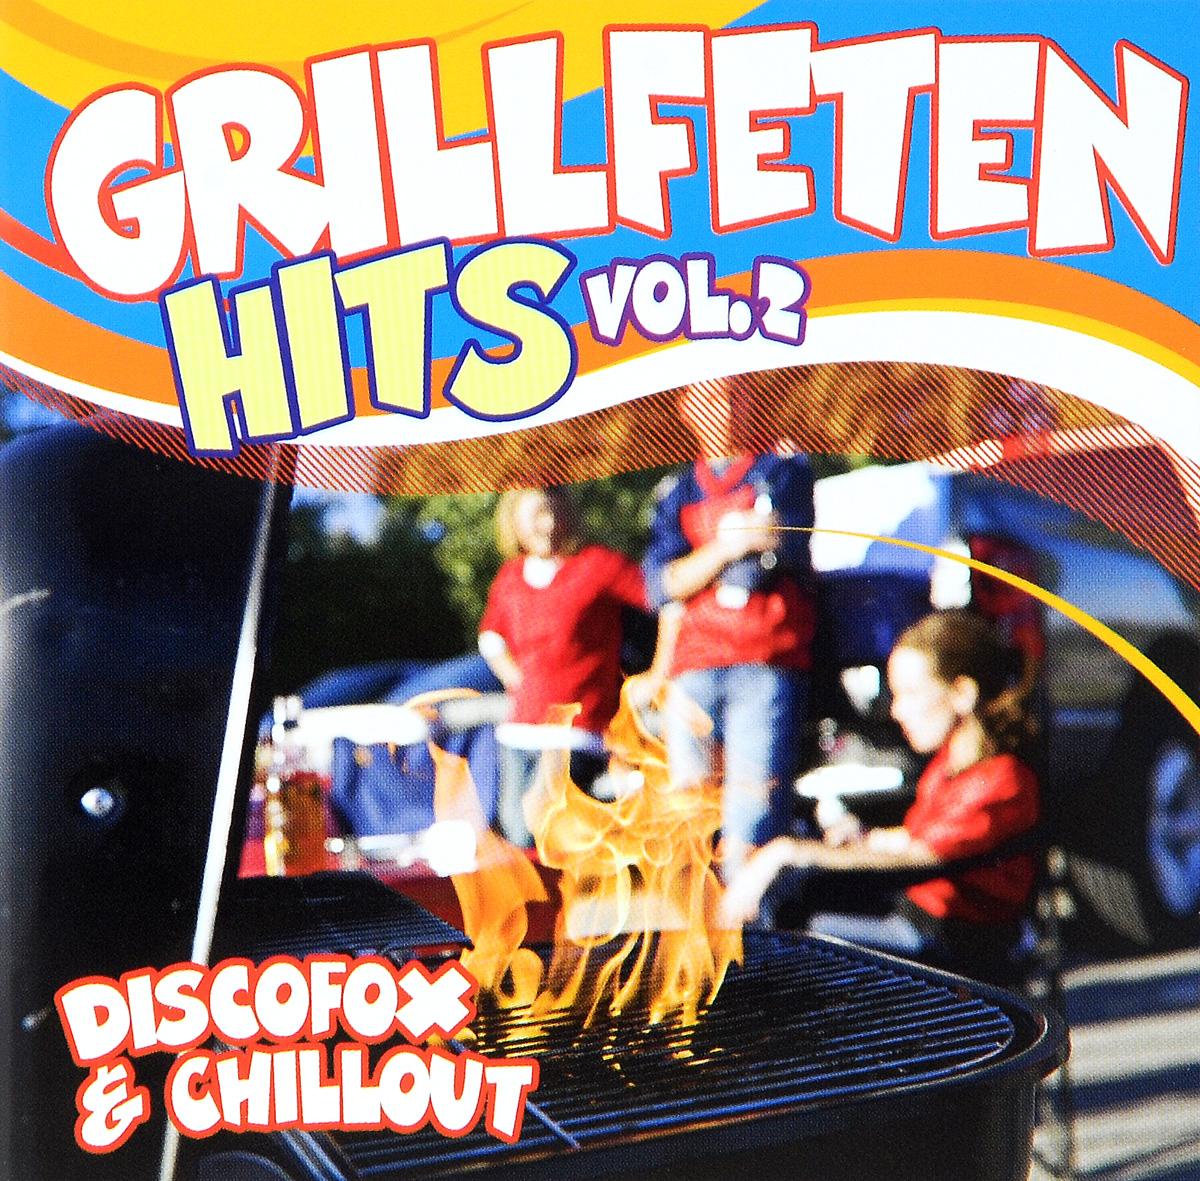 Grillfeten Hits. Vol. 2 (2 CD) недорого